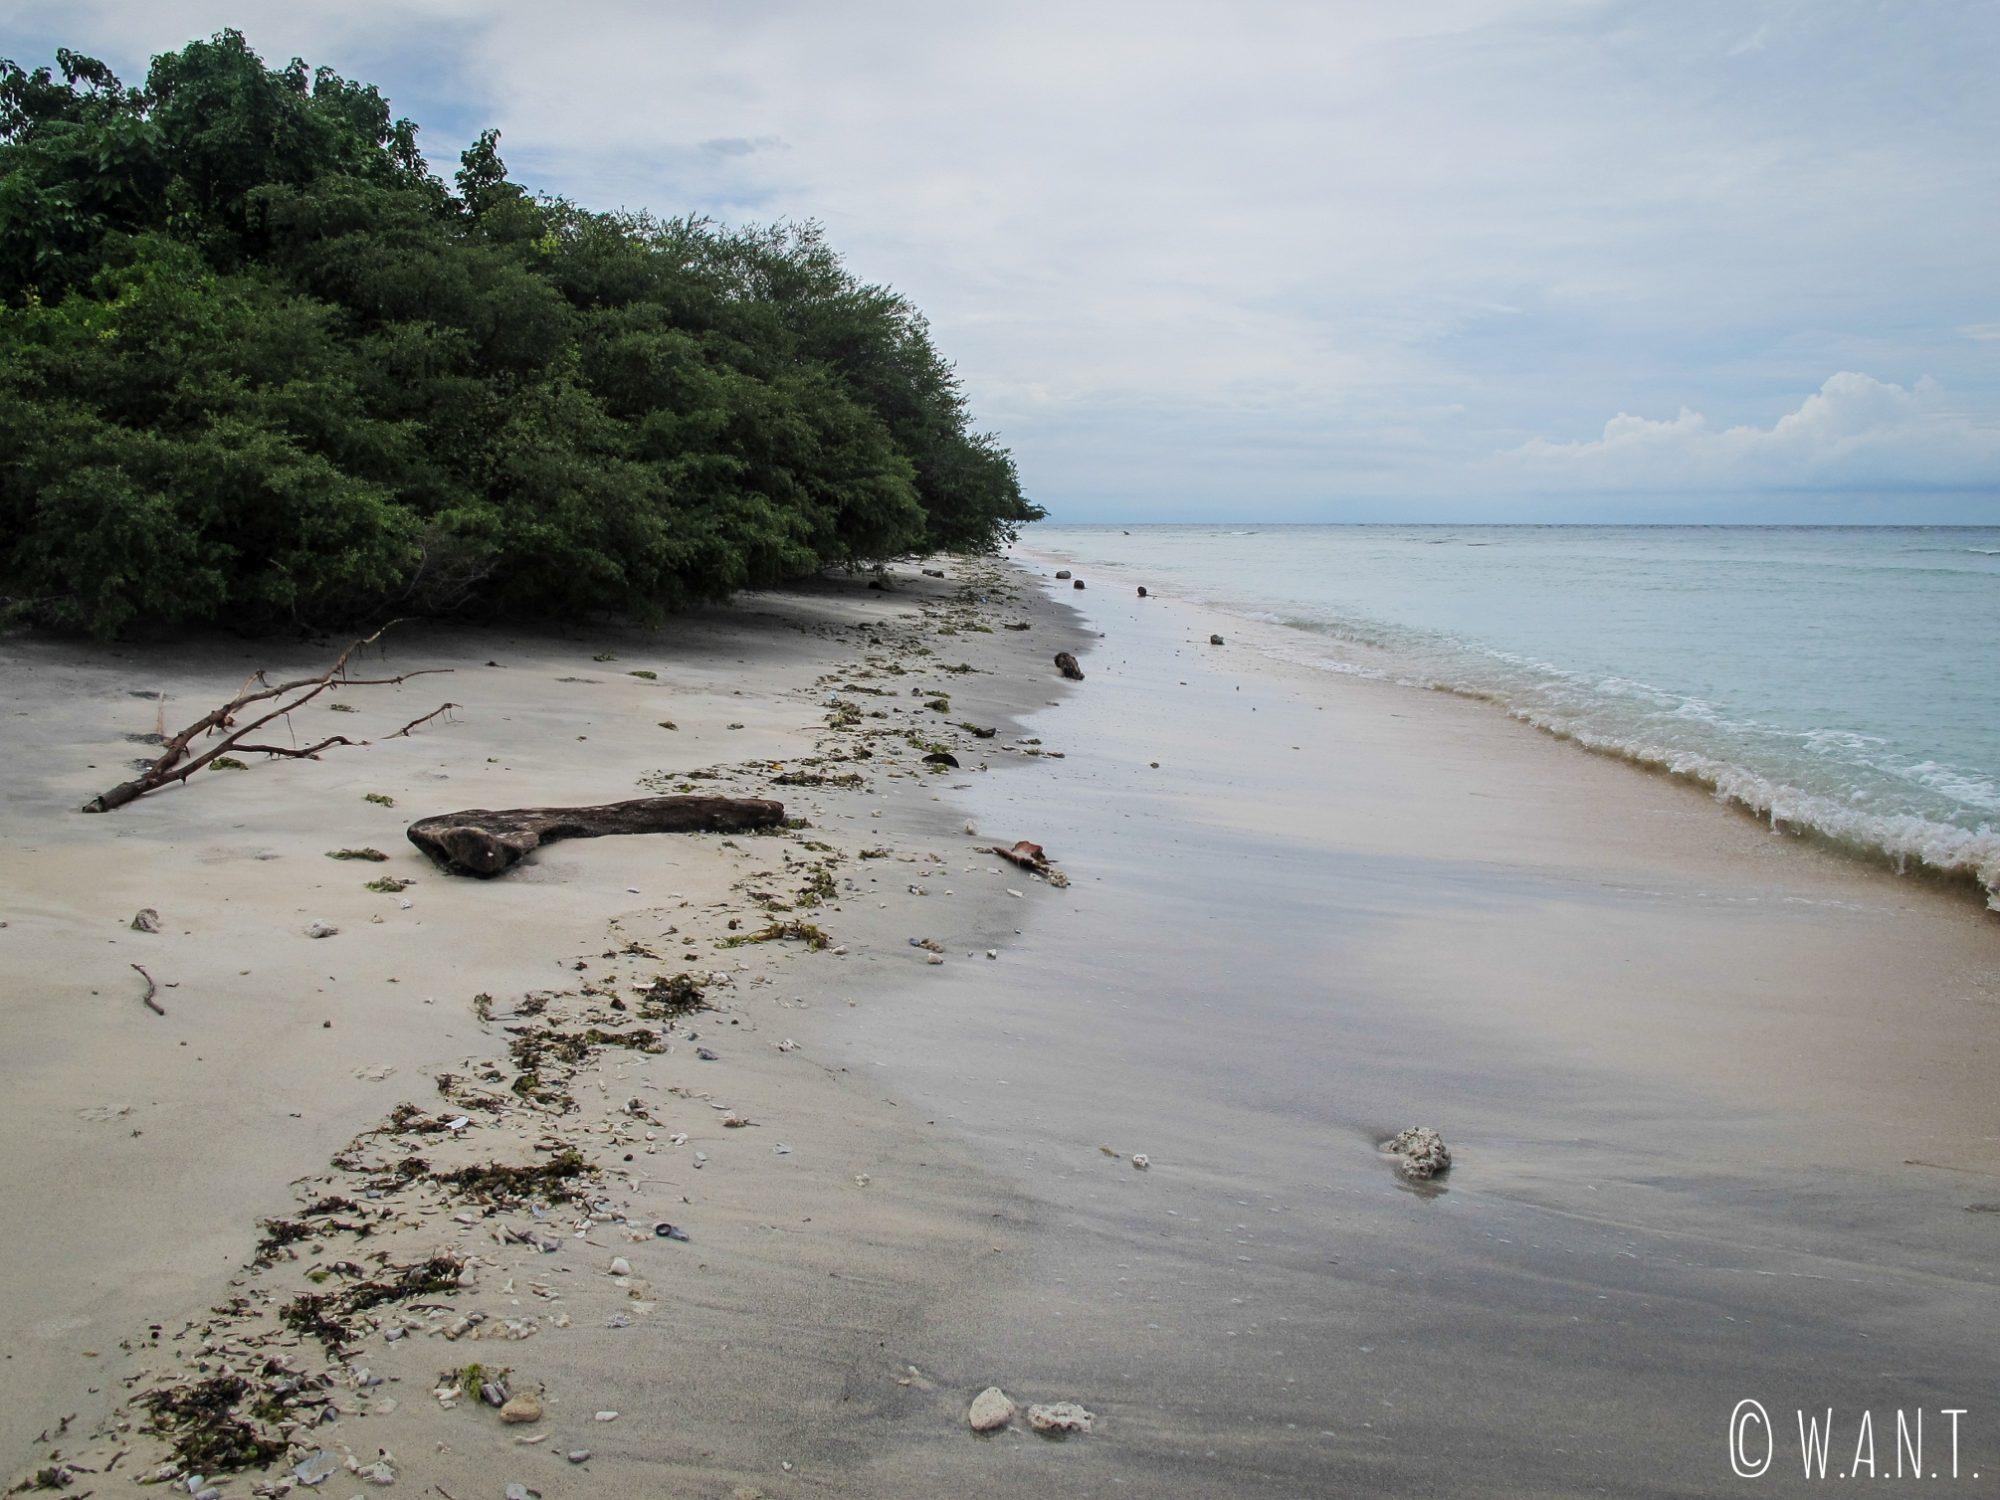 2015 - Plage au nord de Gili Trawangan